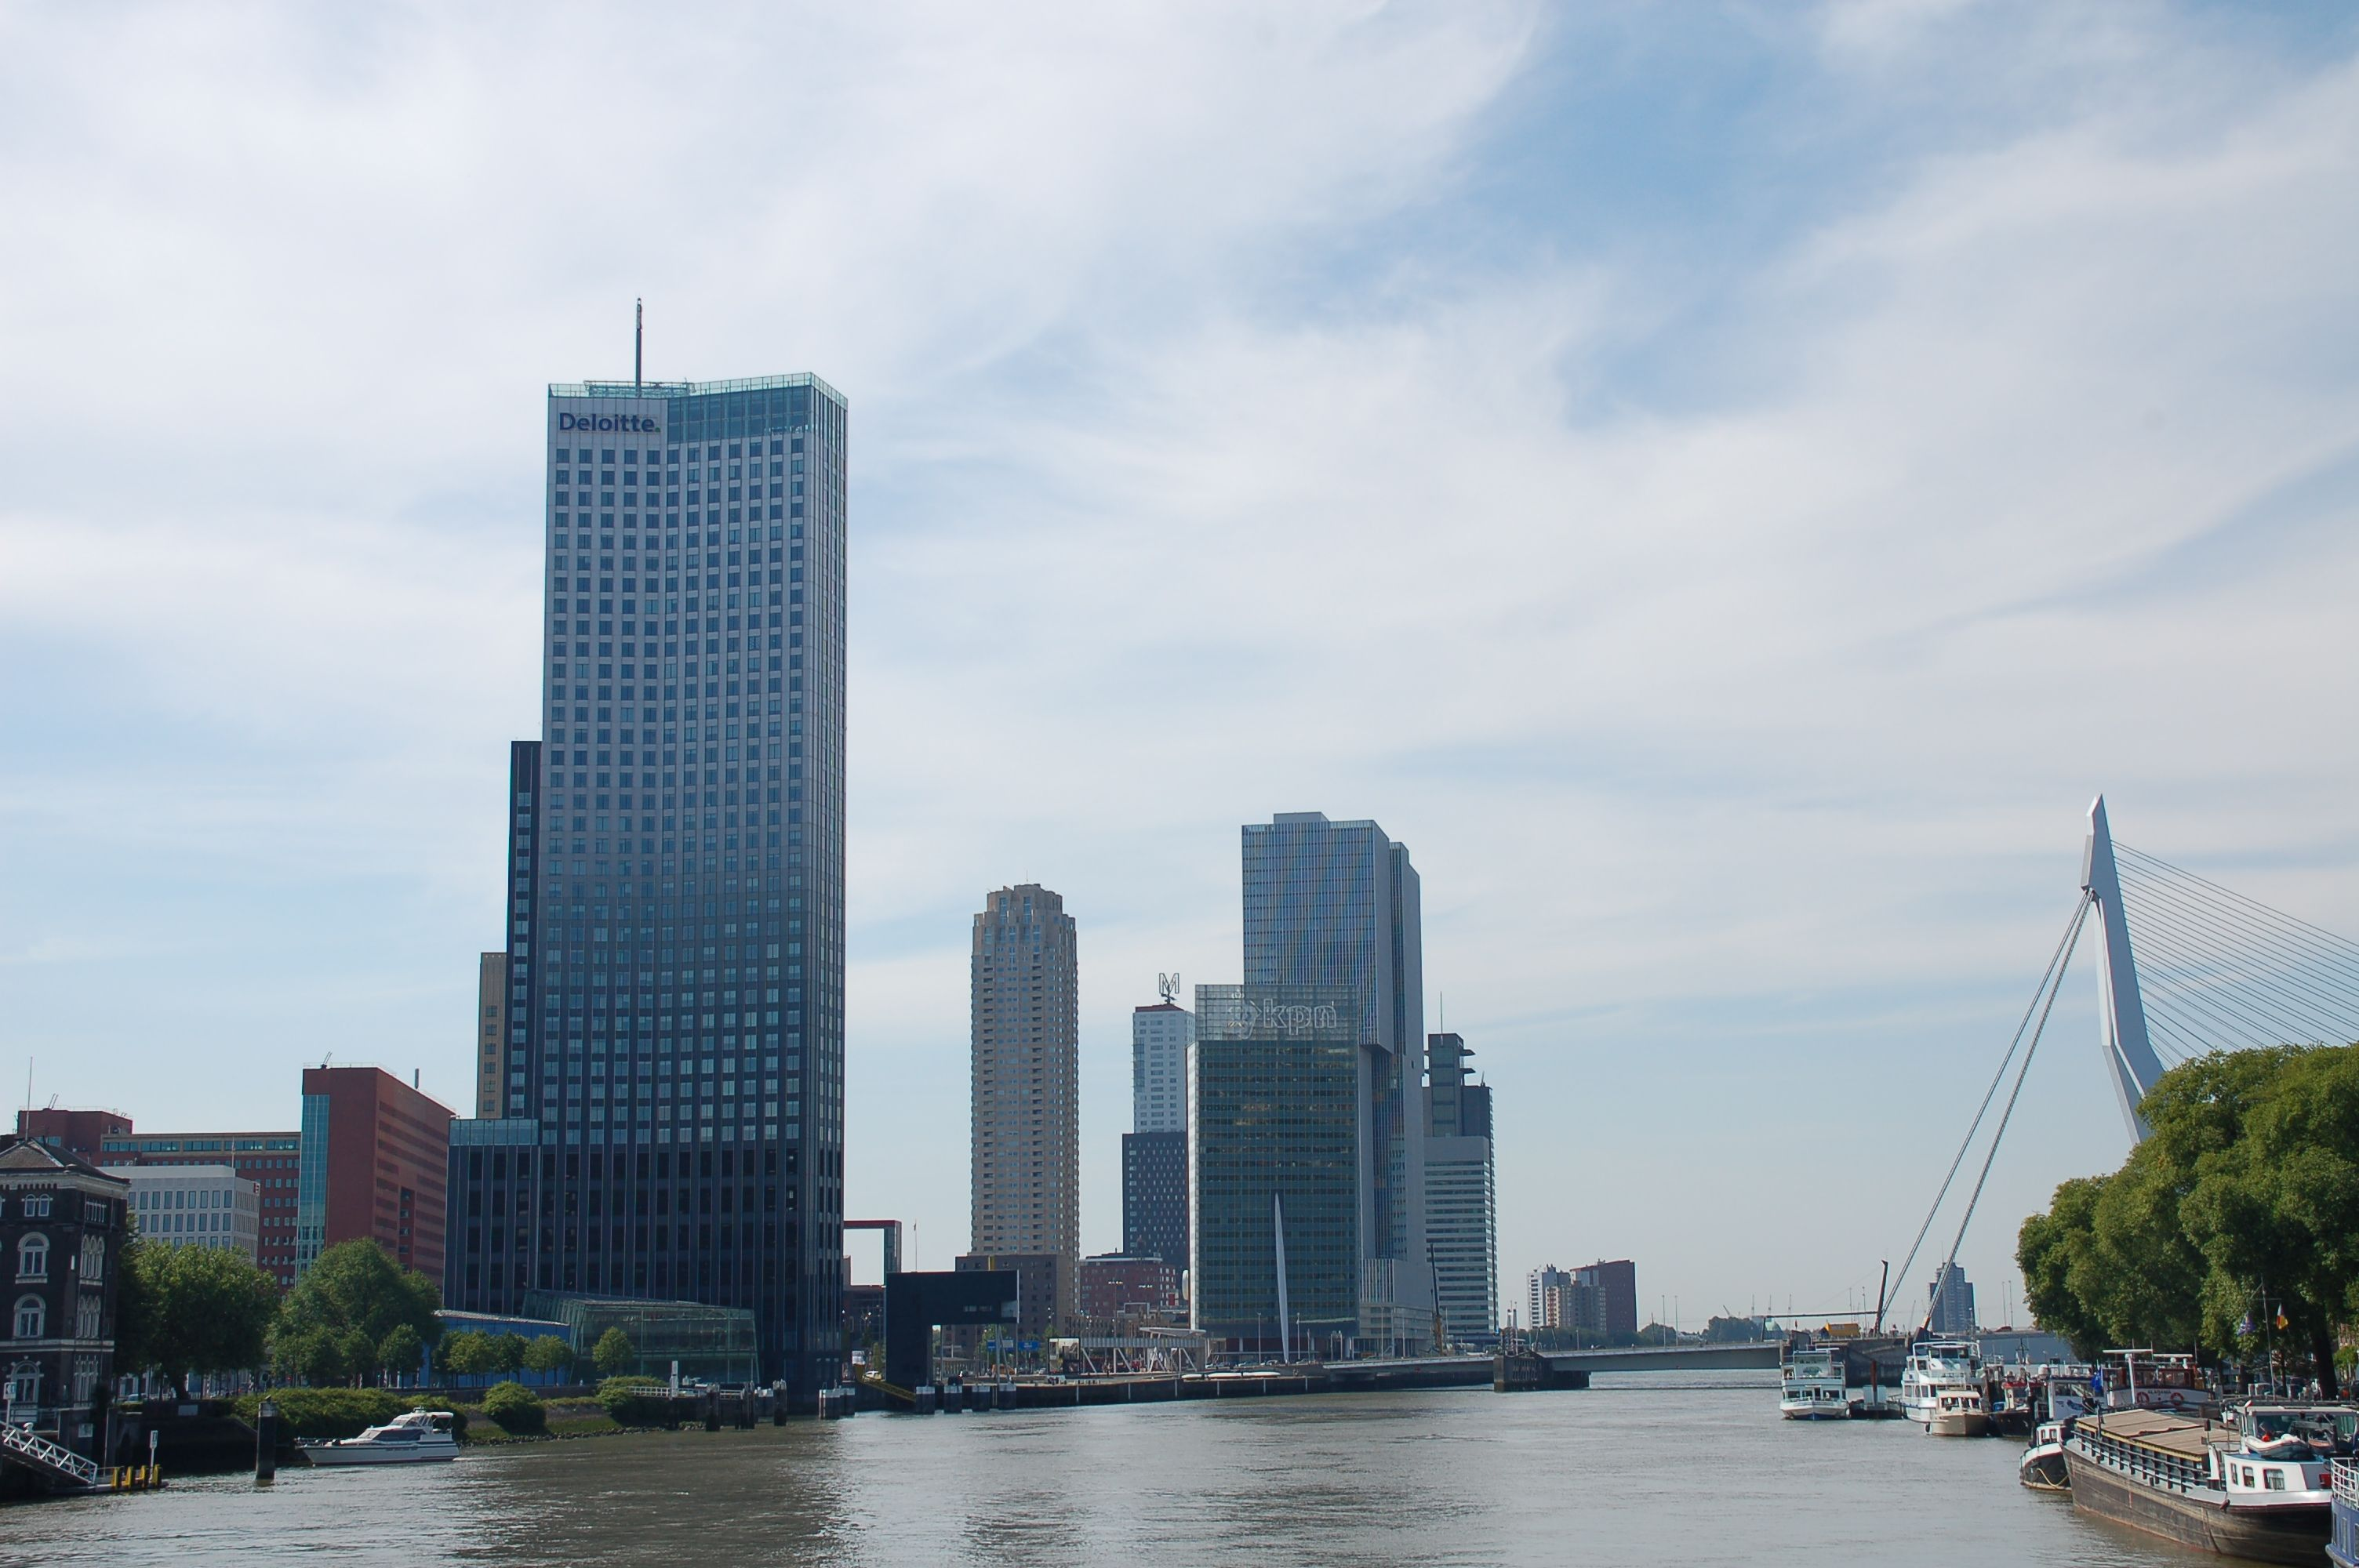 #Rotterdam #Maastoren #Skyline